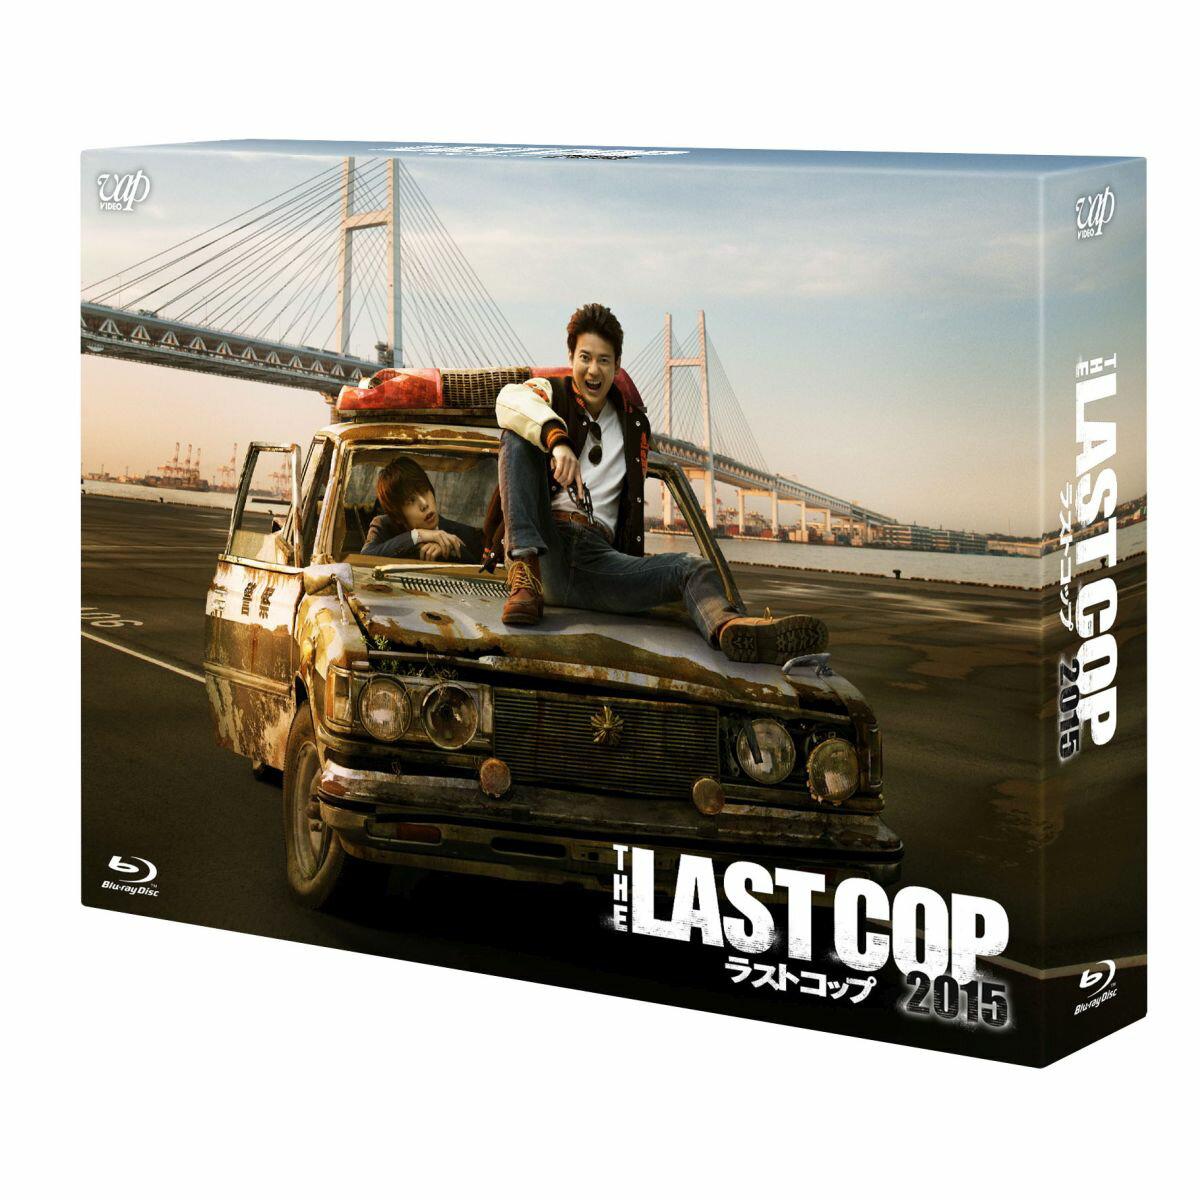 THE LAST COP/ラストコップ2015 Blu-ray BOX【Blu-ray】 [ 唐沢寿明 ]